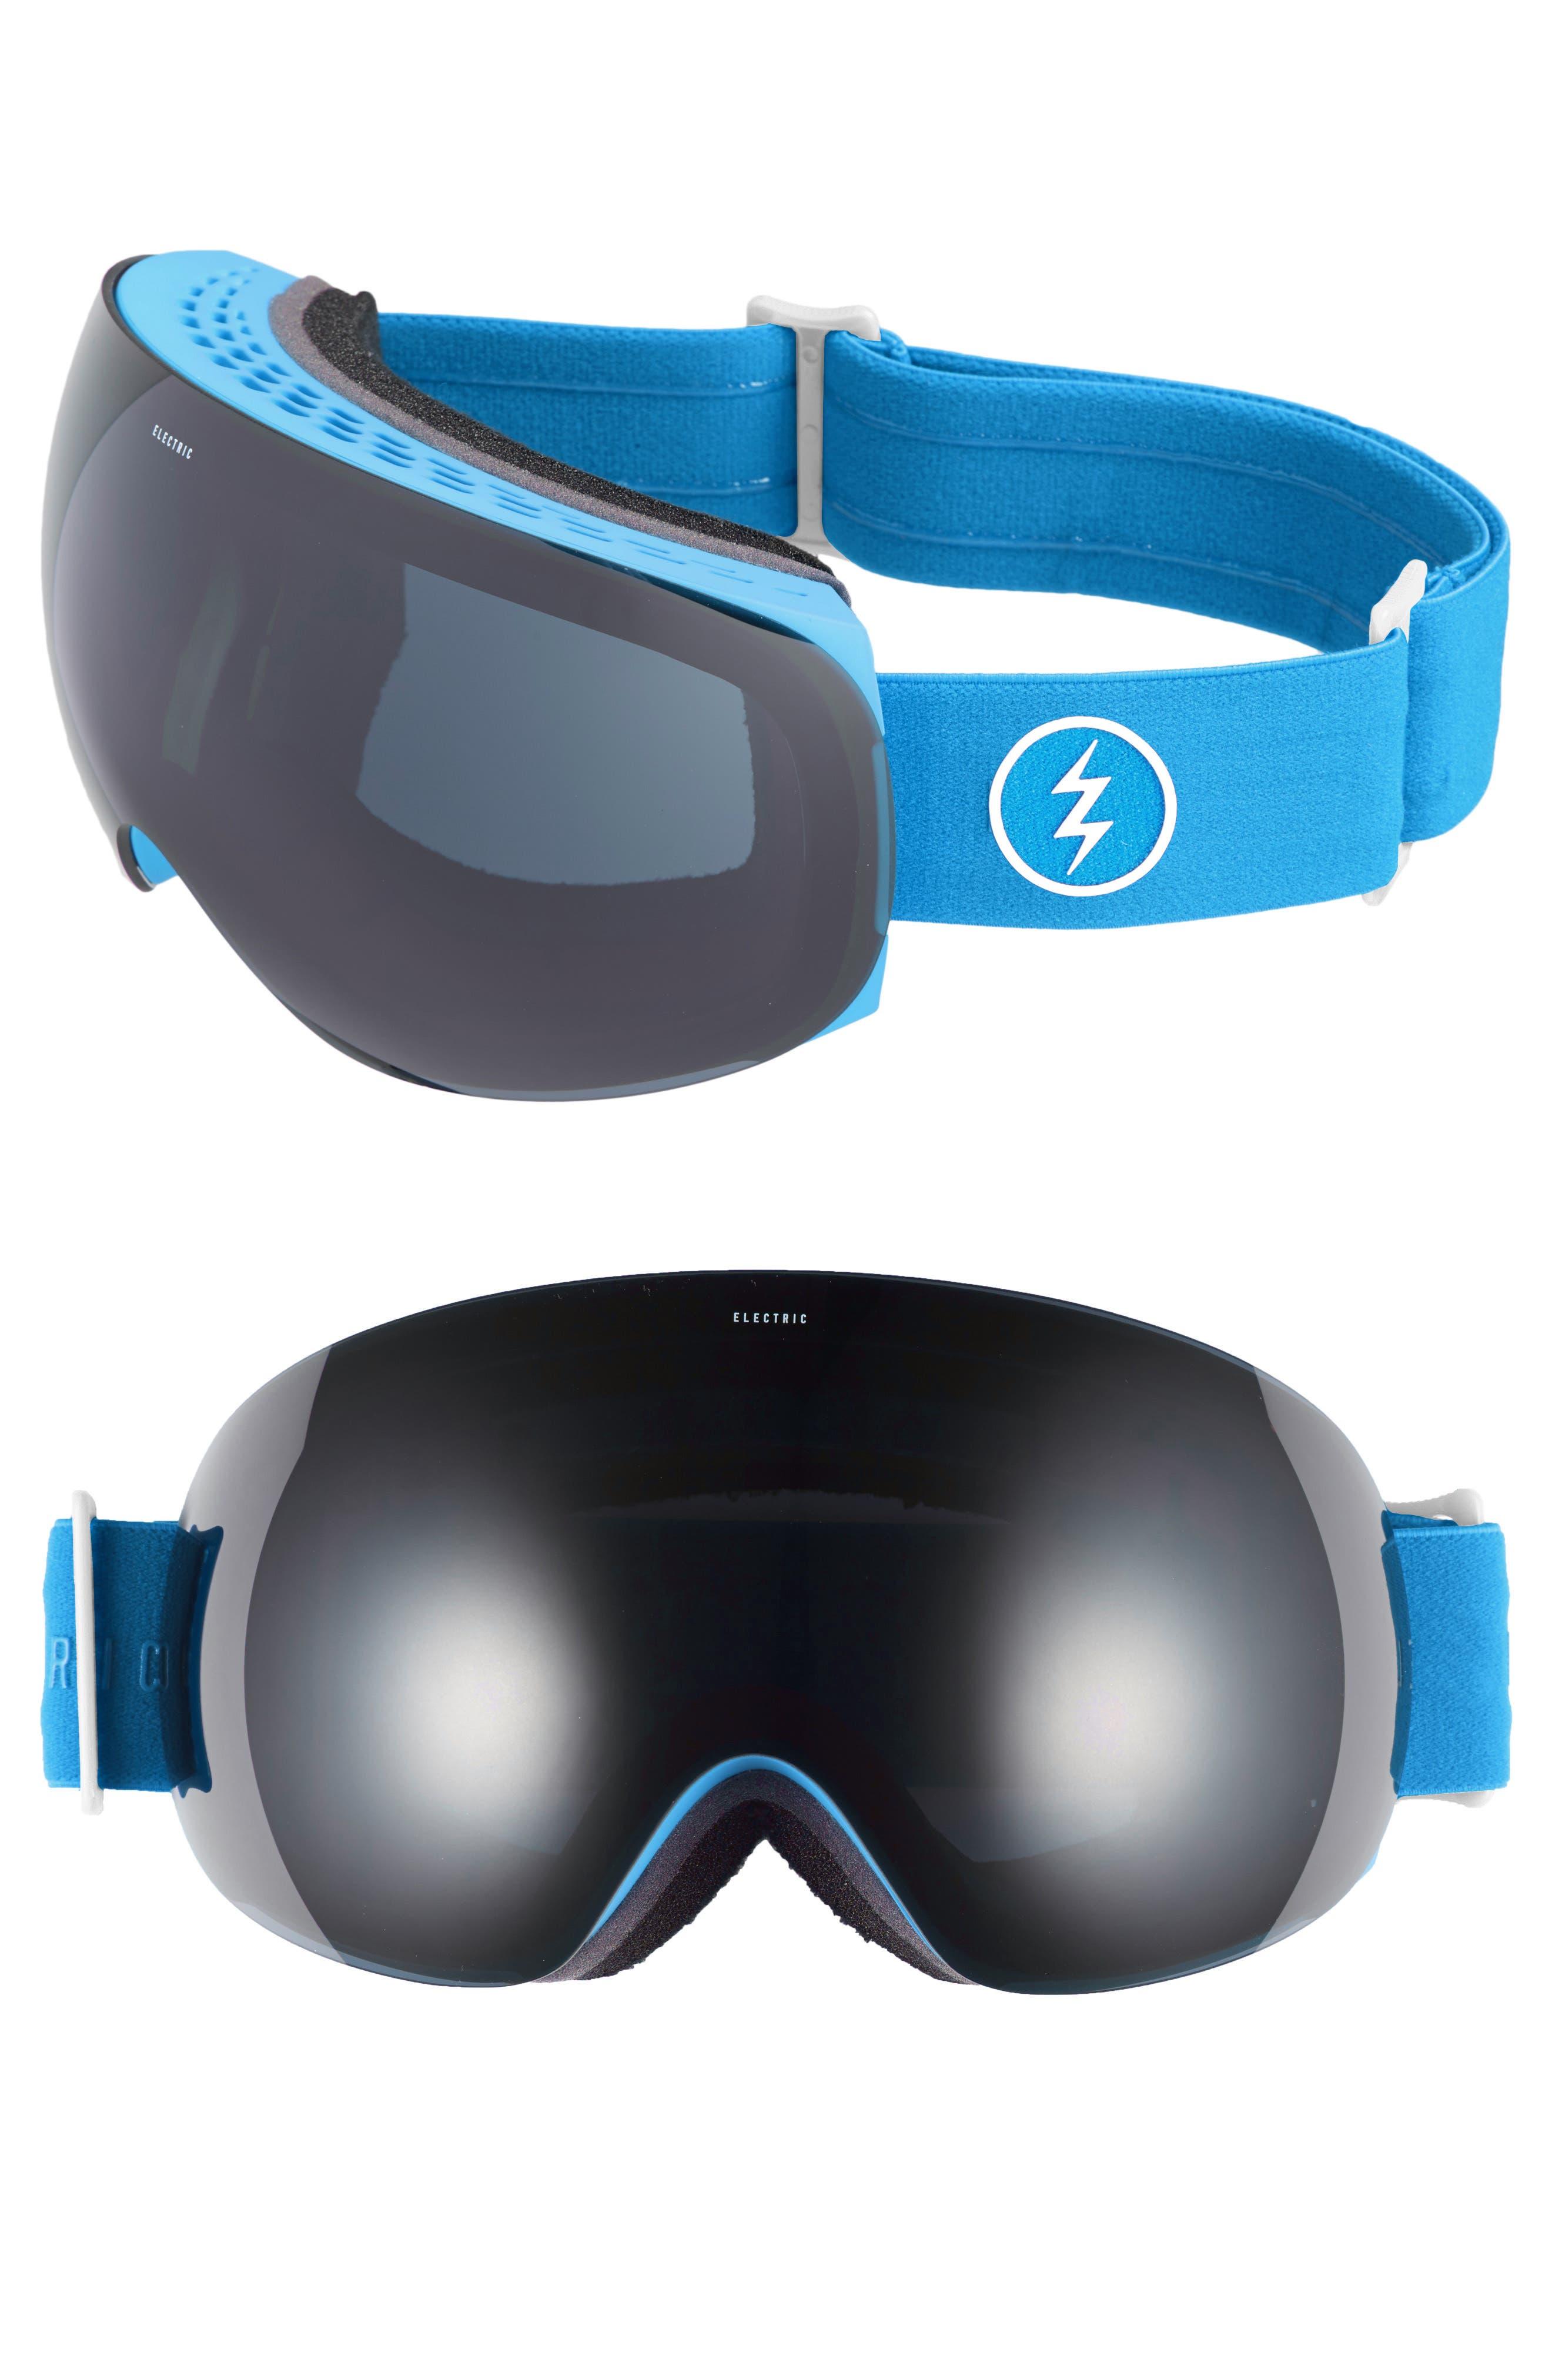 EG3 254mm Snow Goggles,                         Main,                         color, Royal Blue/ Brose/ Silver